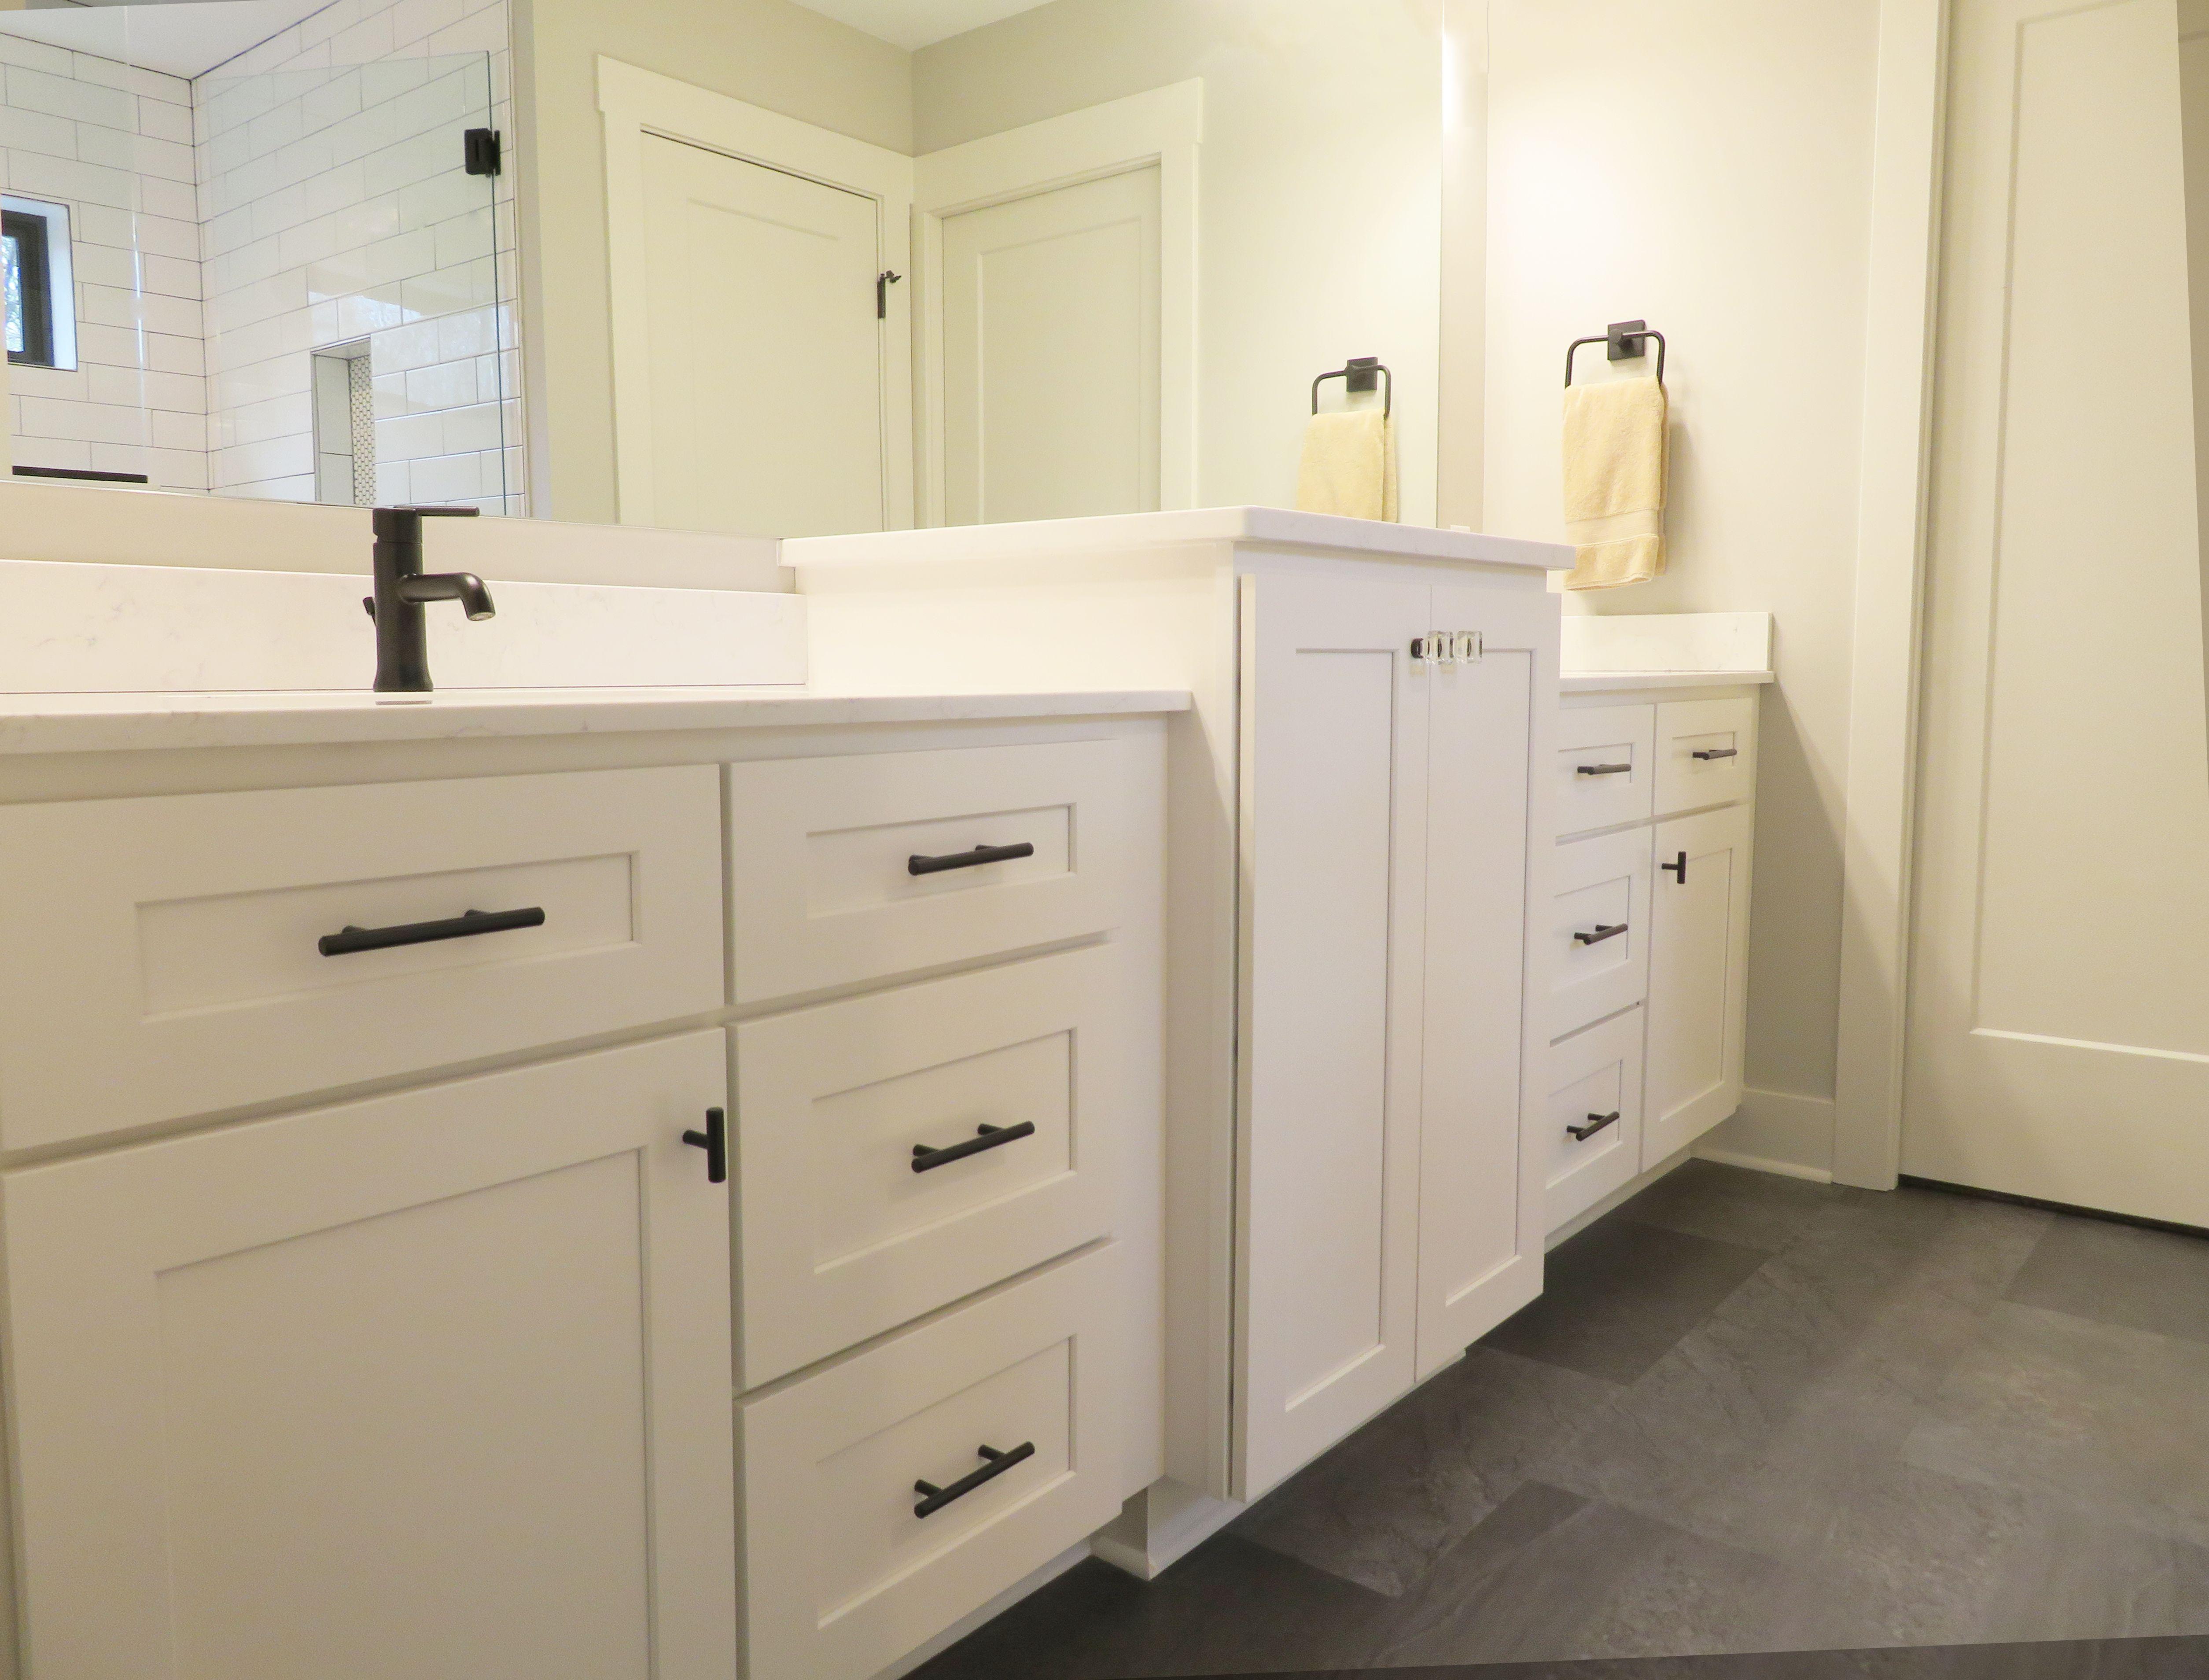 Cabinetry By River Run Desoto White Countertops By Vicostone In Misterio Bathroom Design Bathroom Layout Kitchen Design